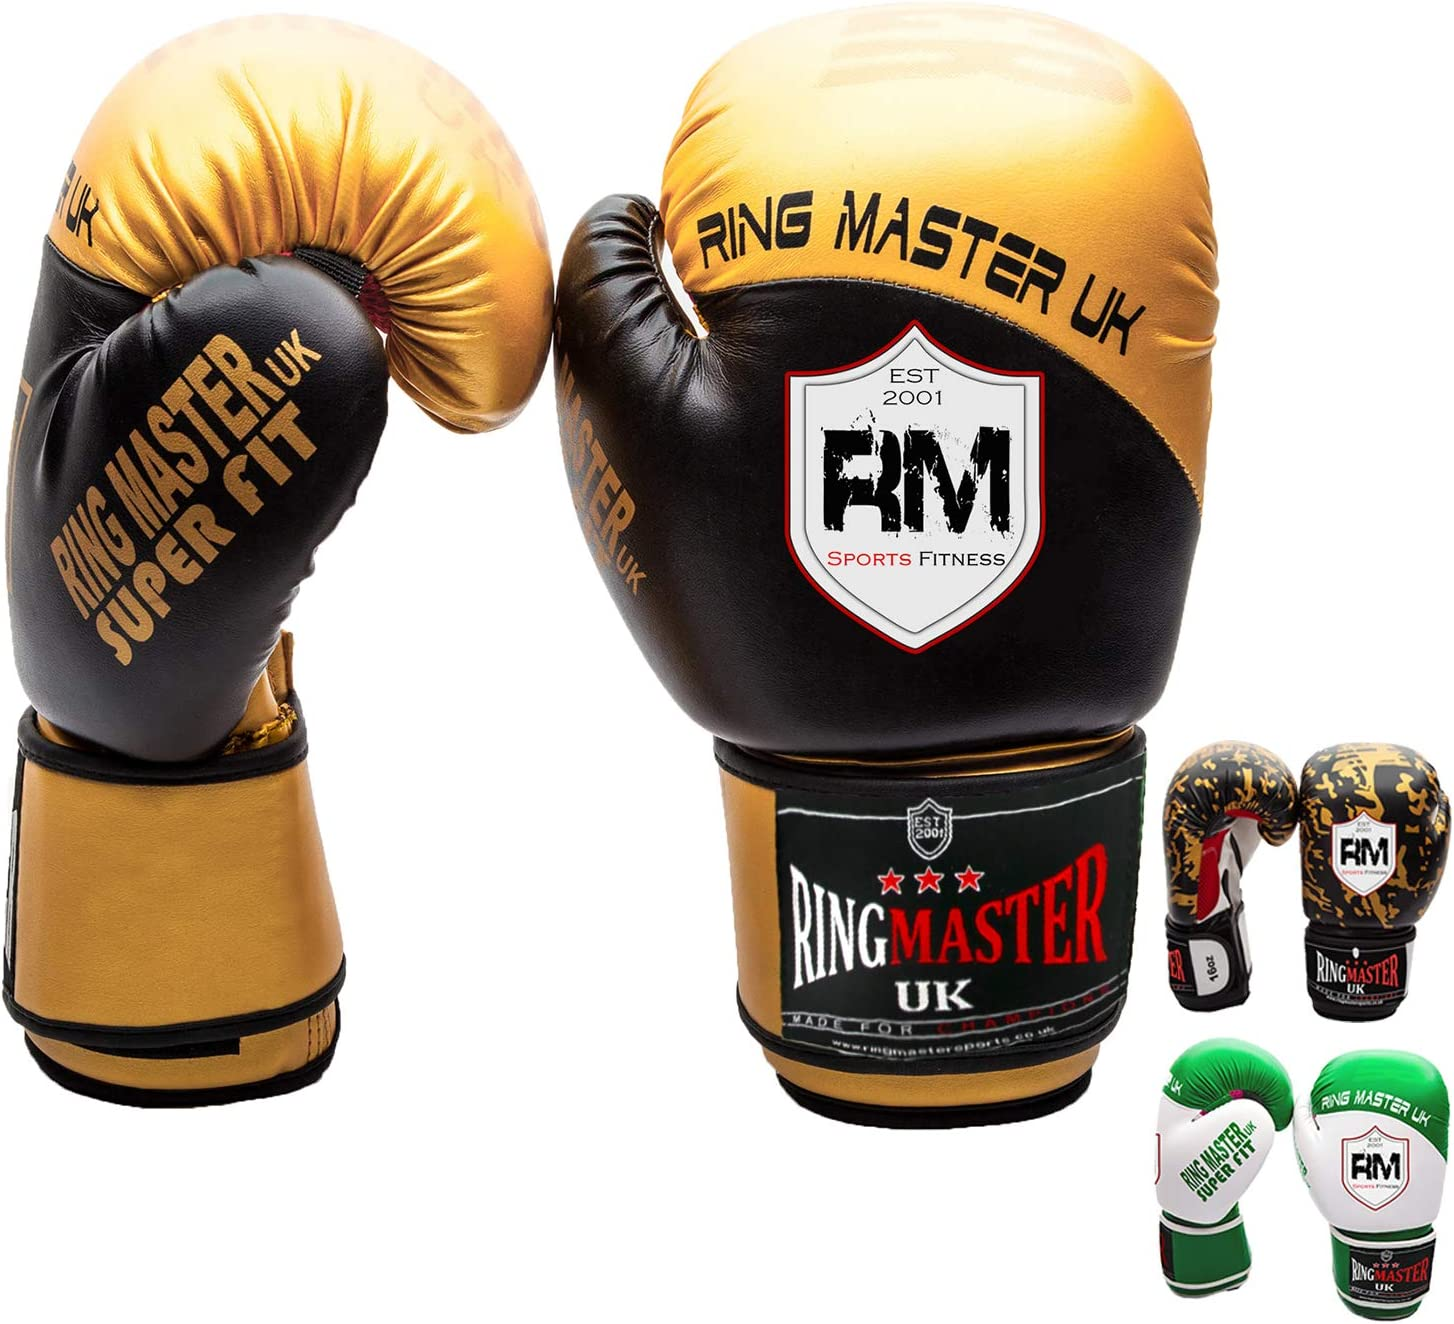 REEBOK BOXING GLOVES Black Gold Combat Punch Sparring Boxing Gloves 12oz 16oz